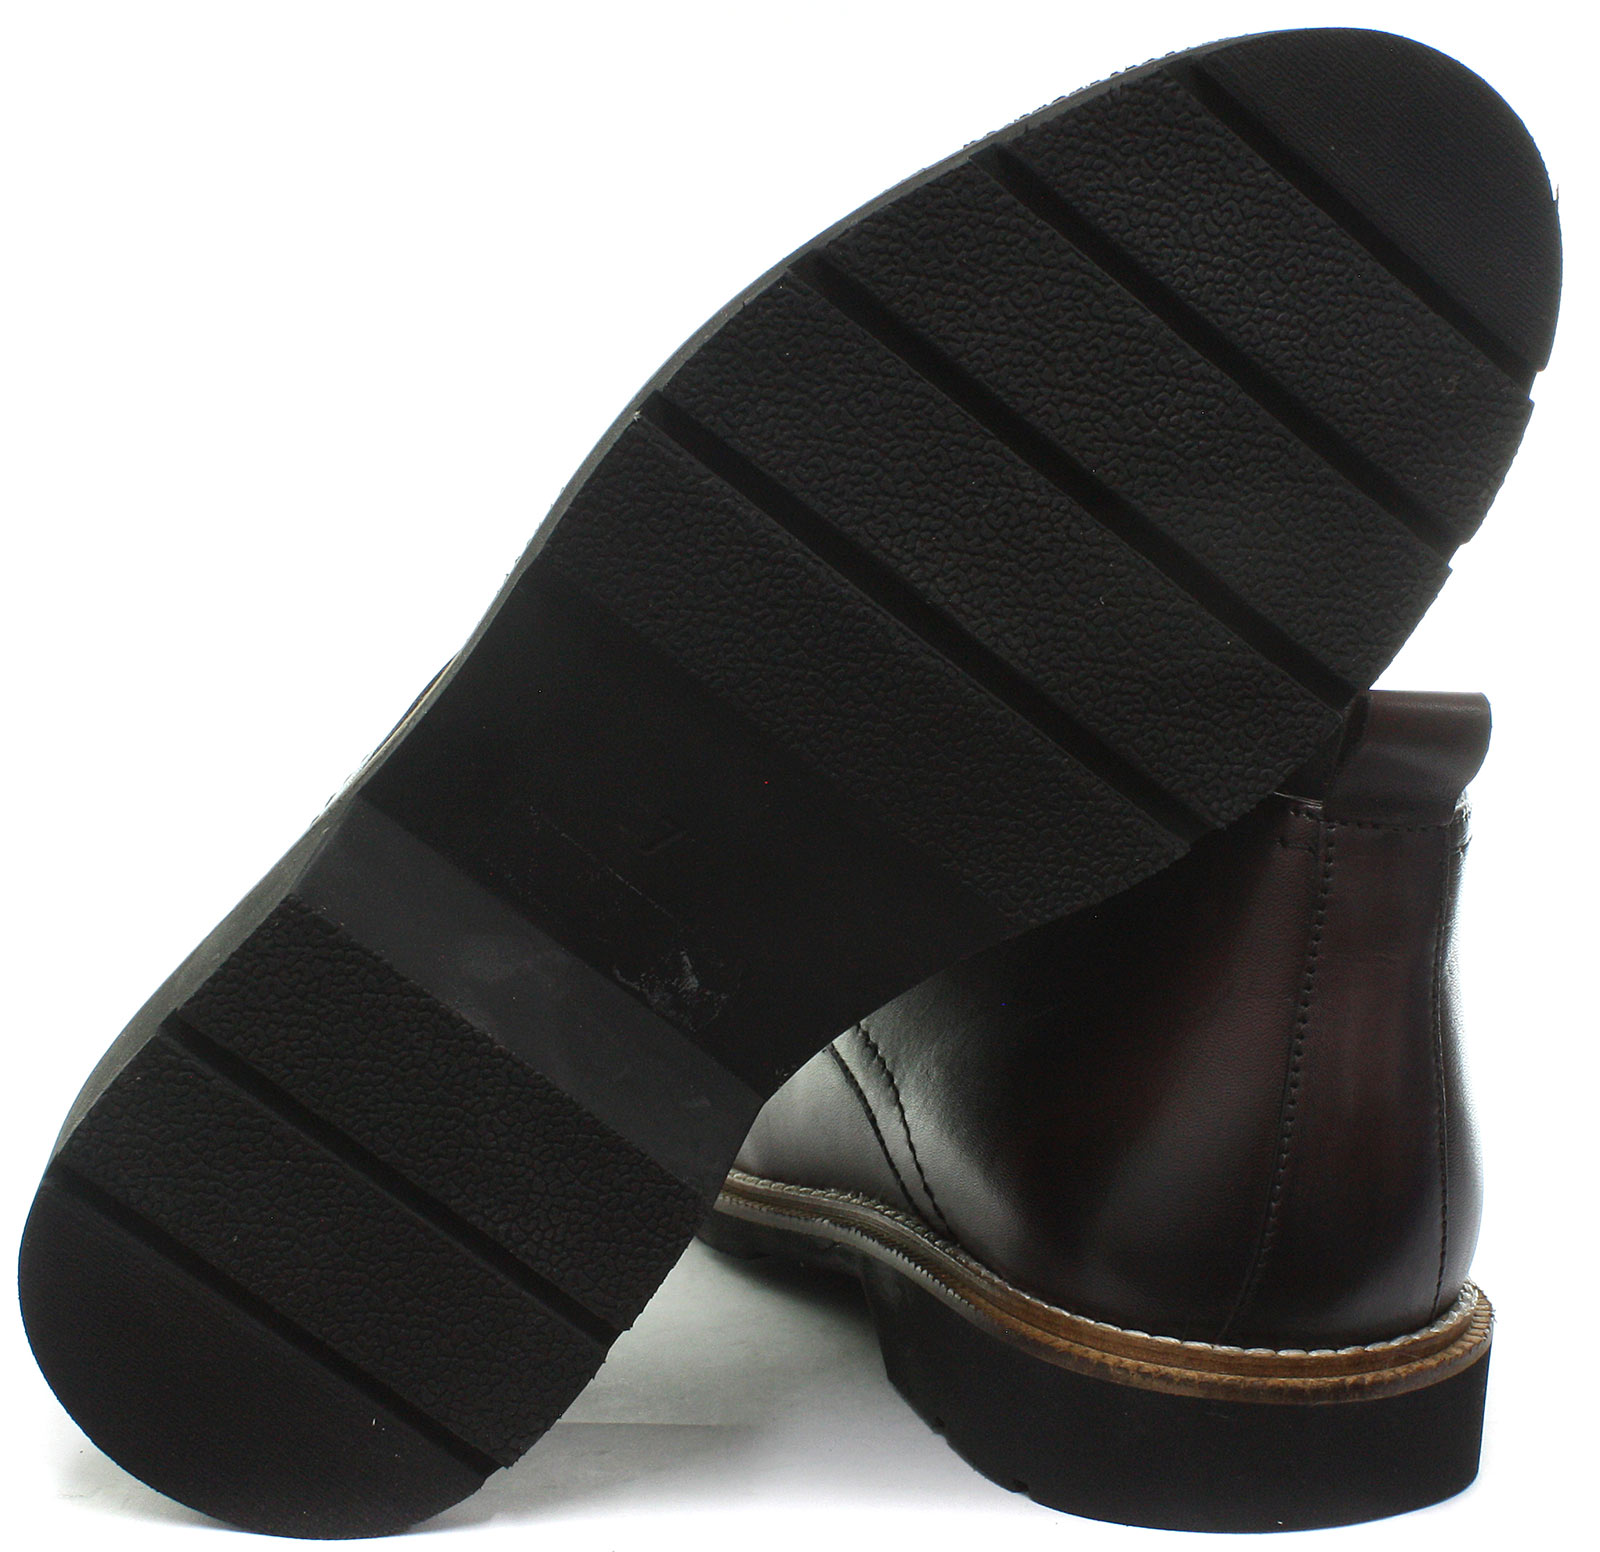 New-Roamers-2-Eye-Mens-Chukka-Boots-ALL-SIZES miniature 3